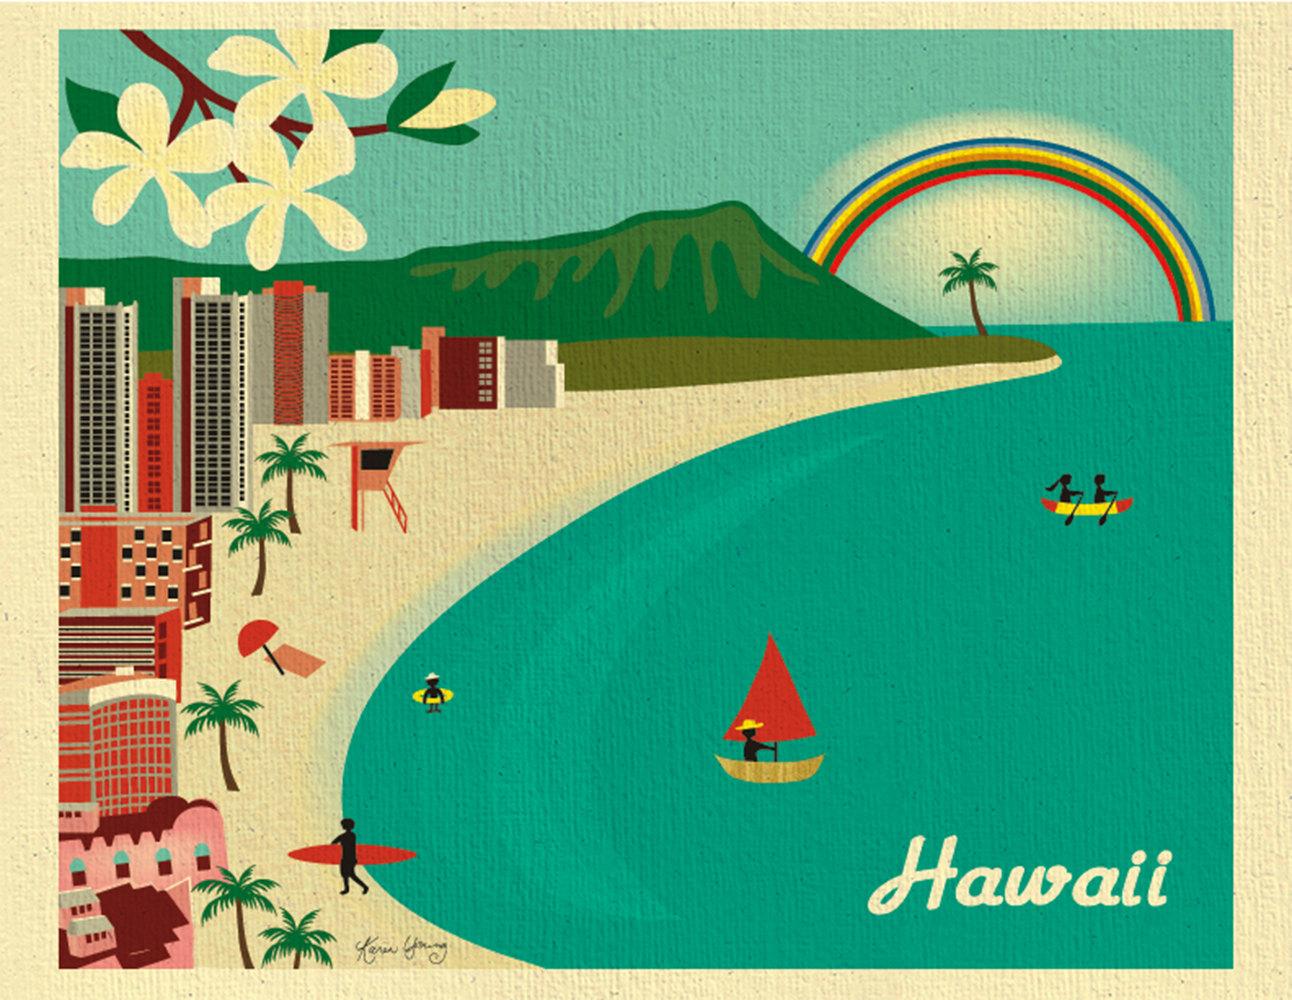 Waikiki clipart #19, Download drawings